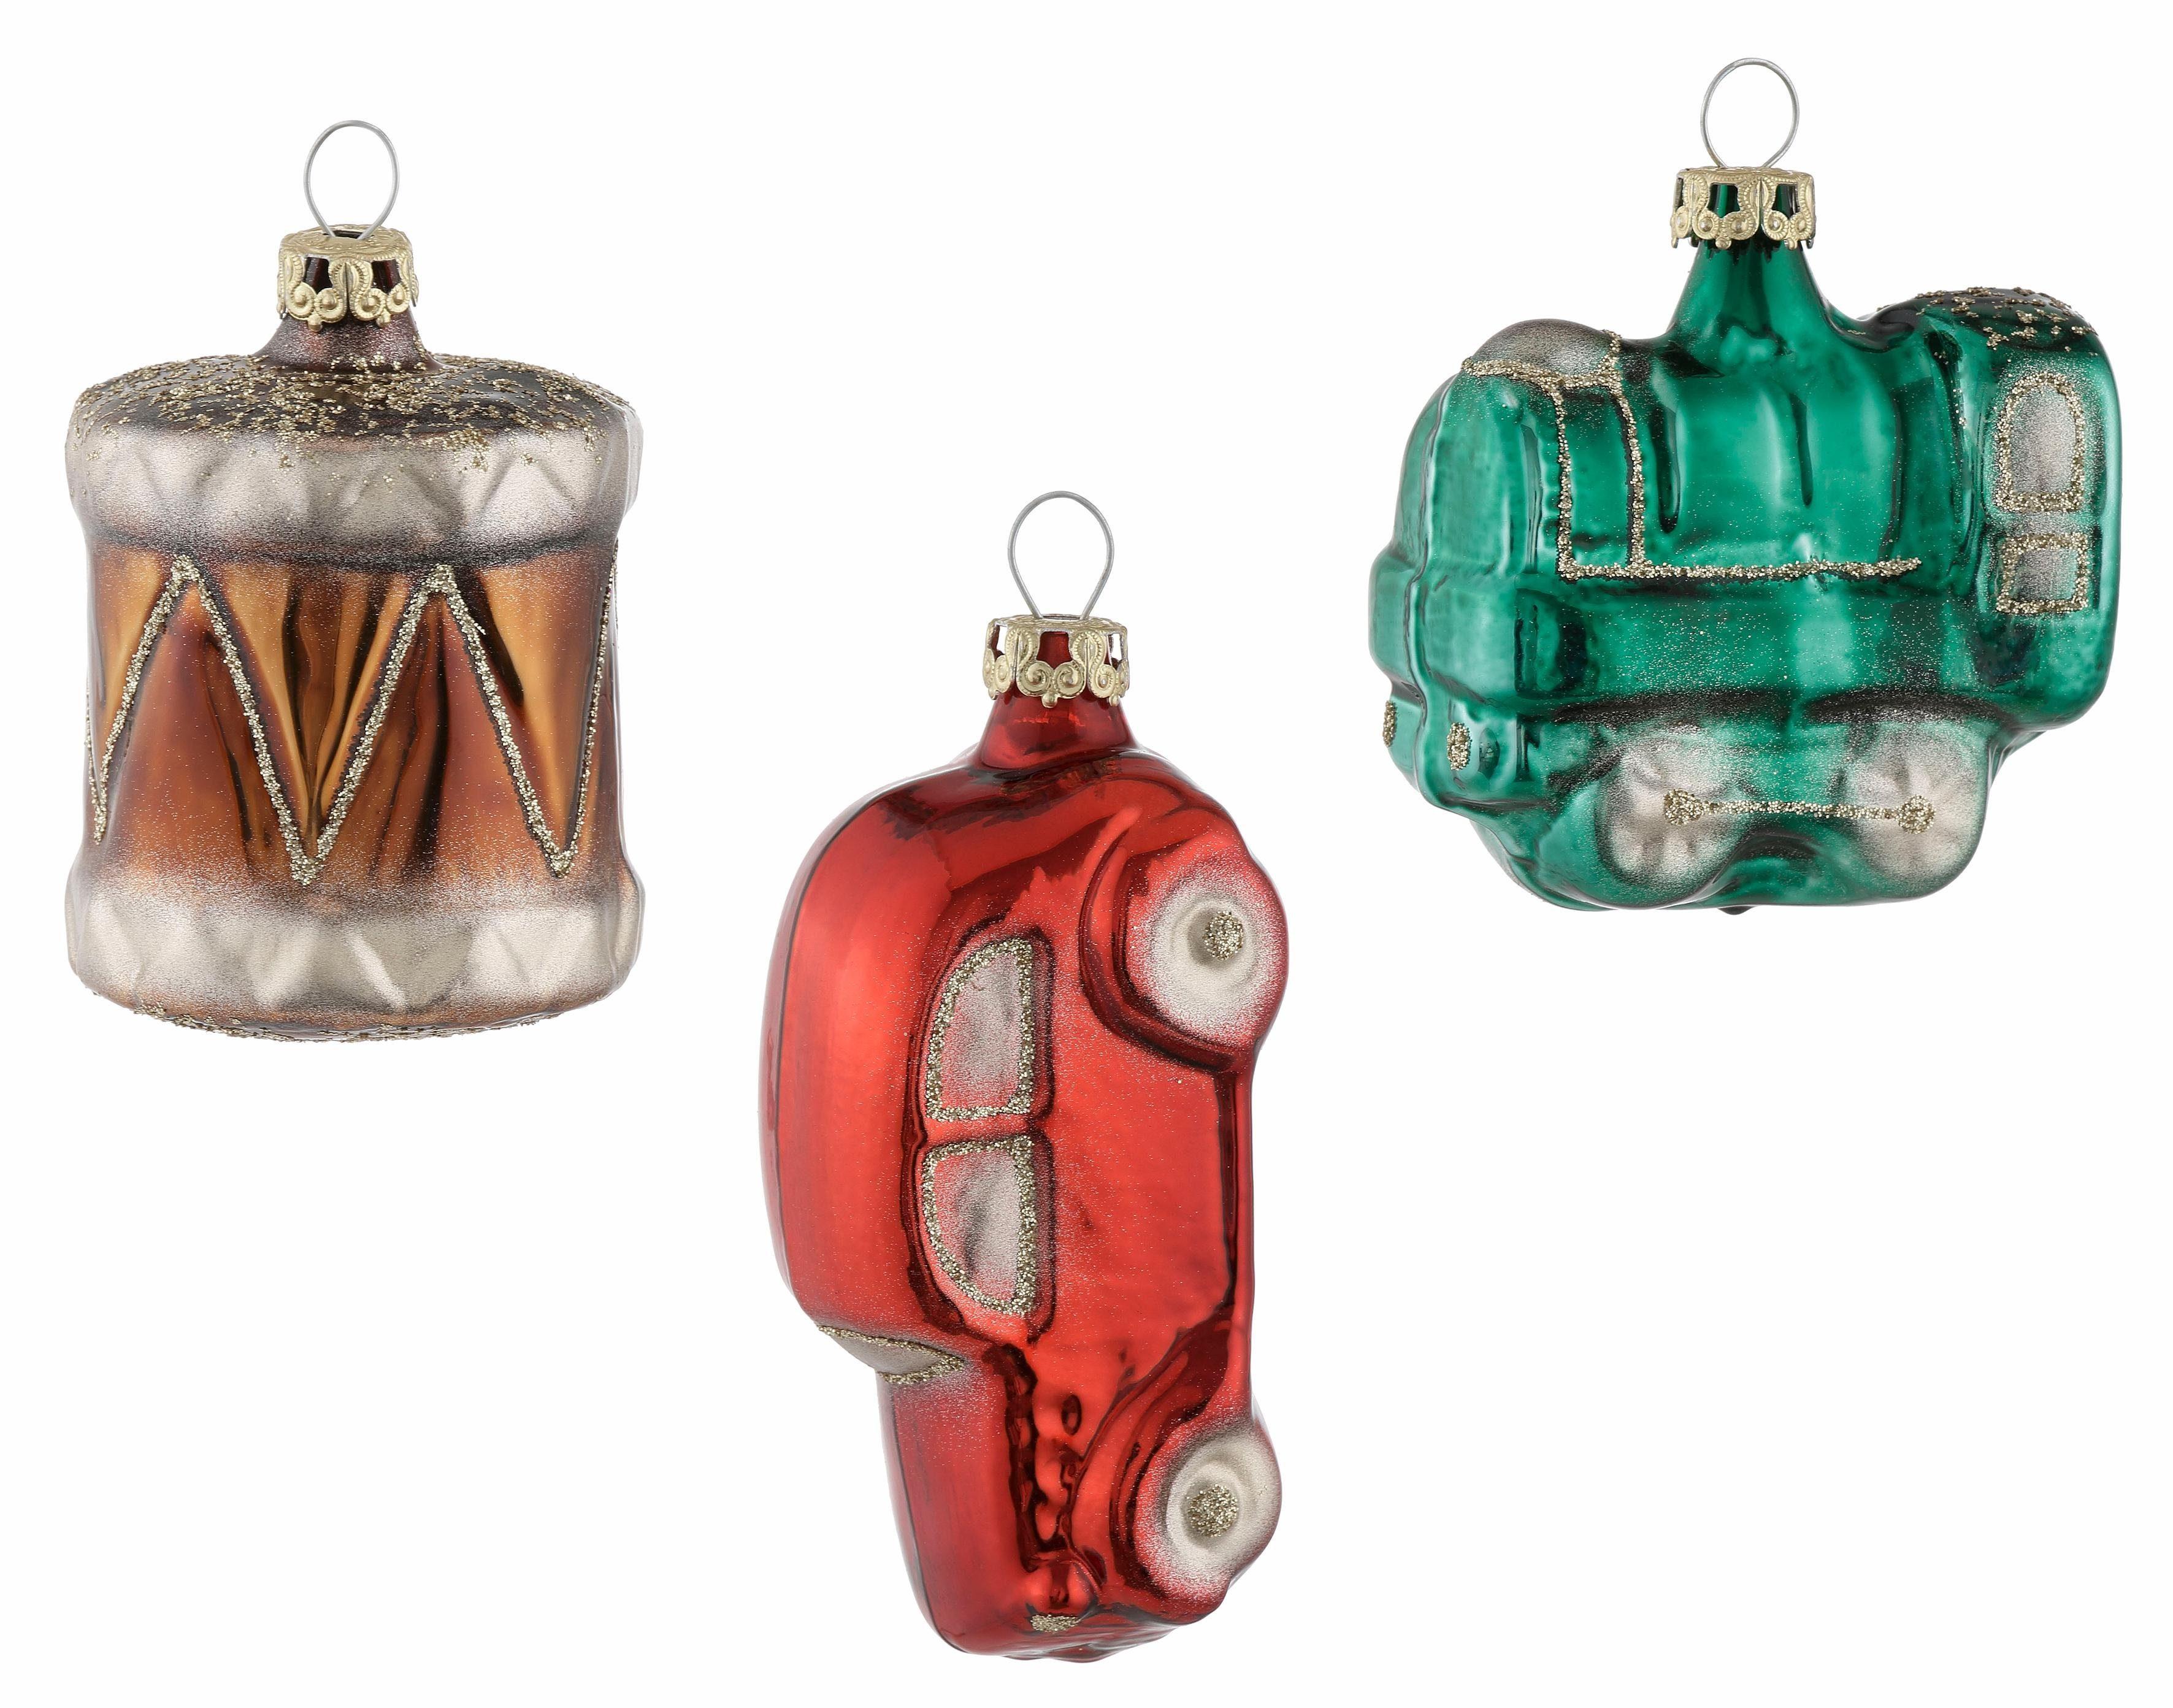 Thüringer Glasdesign TGS-Christbaumschmuck Spielzeug-Sortiment, (3tlg), »Lieblingsstücke«